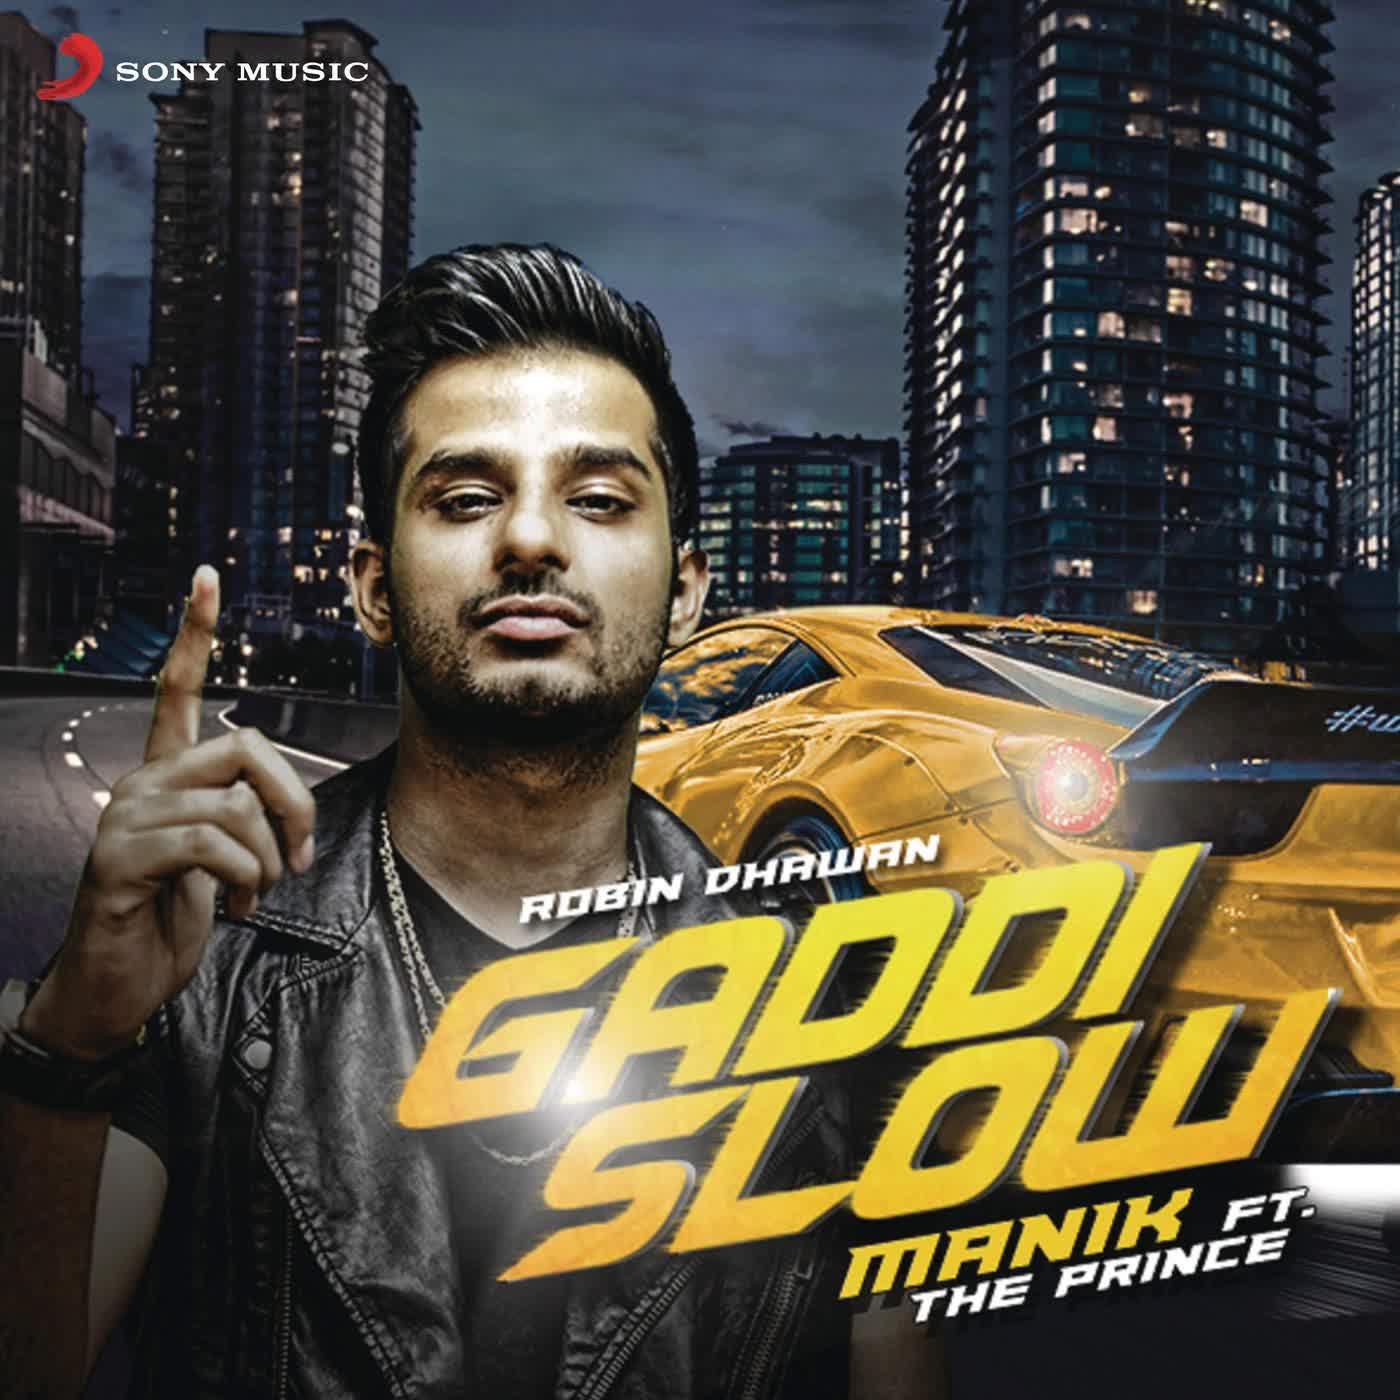 Gaddi Slow Manik Mp3 Song